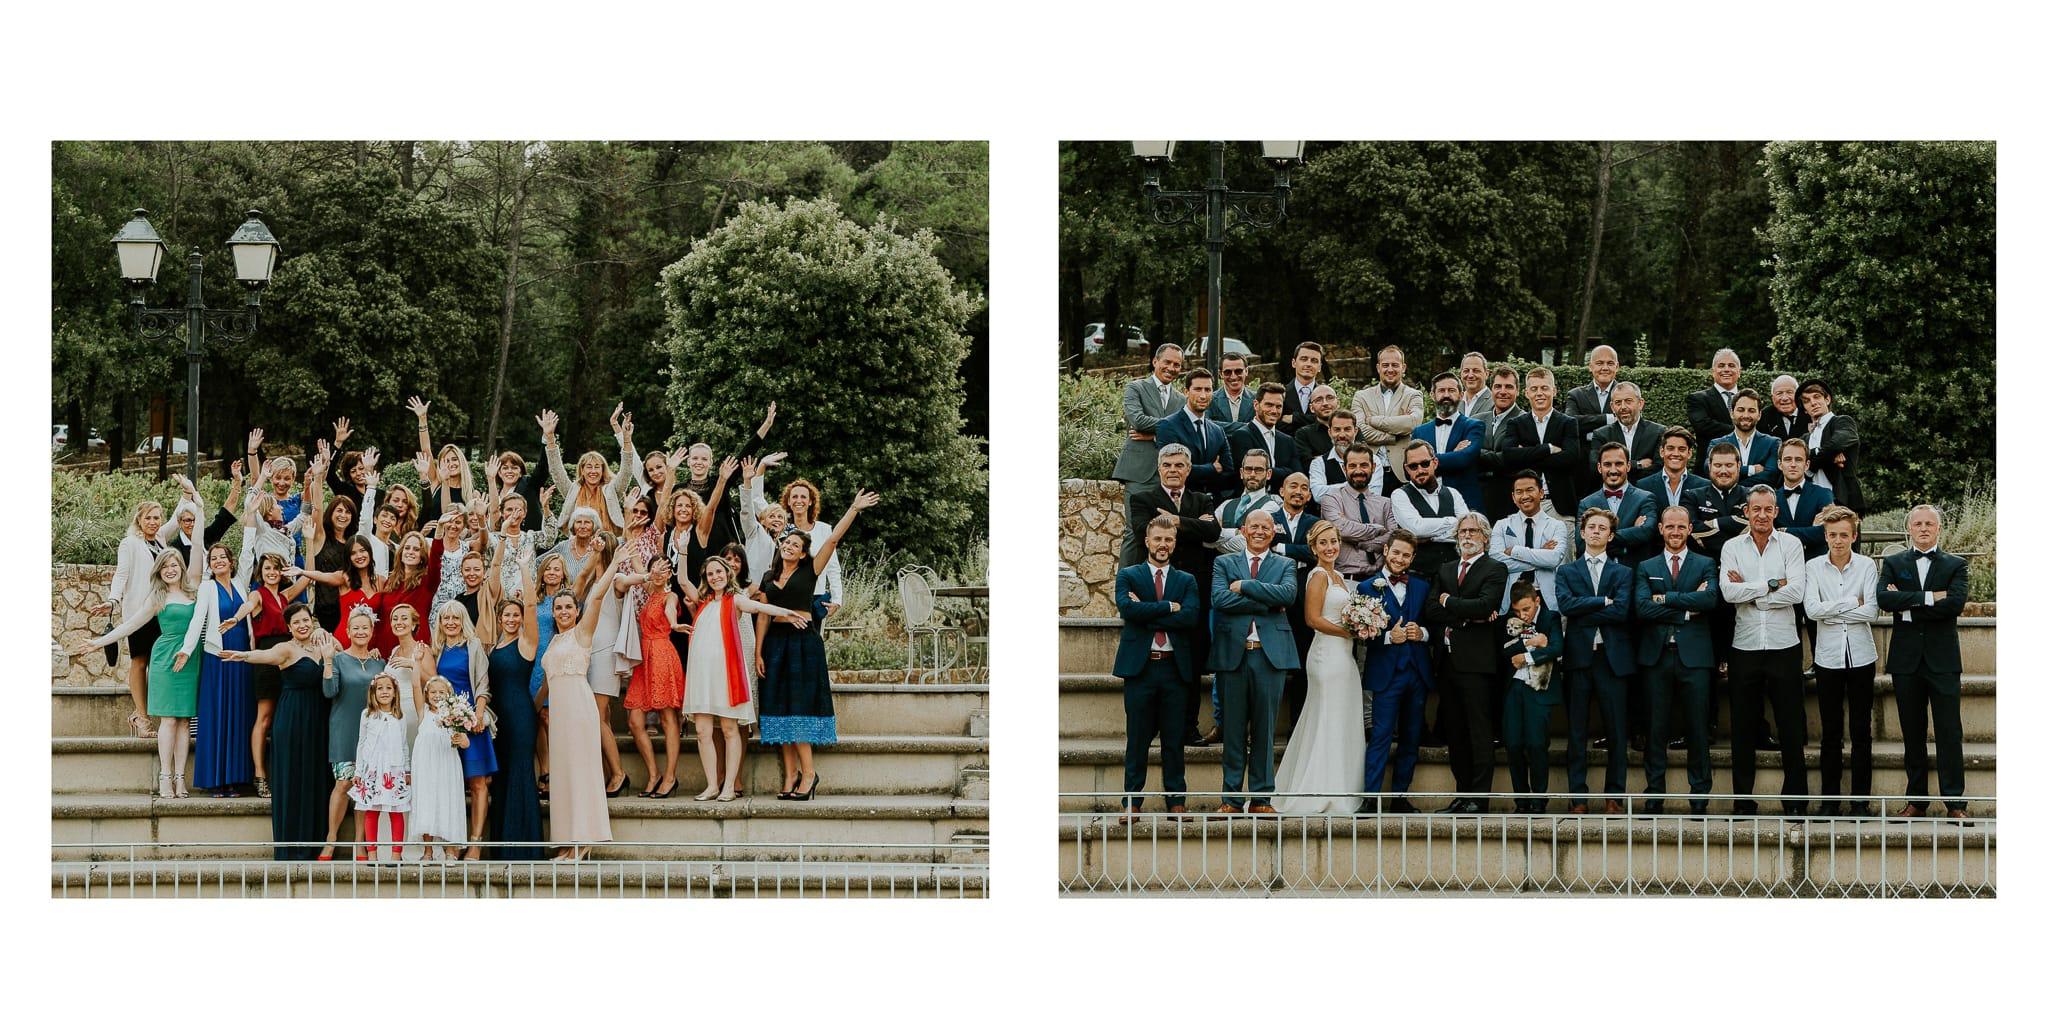 Costi-Moiceanu-Photographer-CM-Photography-Wedding-Mariage-French-Riviera-Cote-D-Azur-Alpes-Maritimes-Weding-Album-Design-12